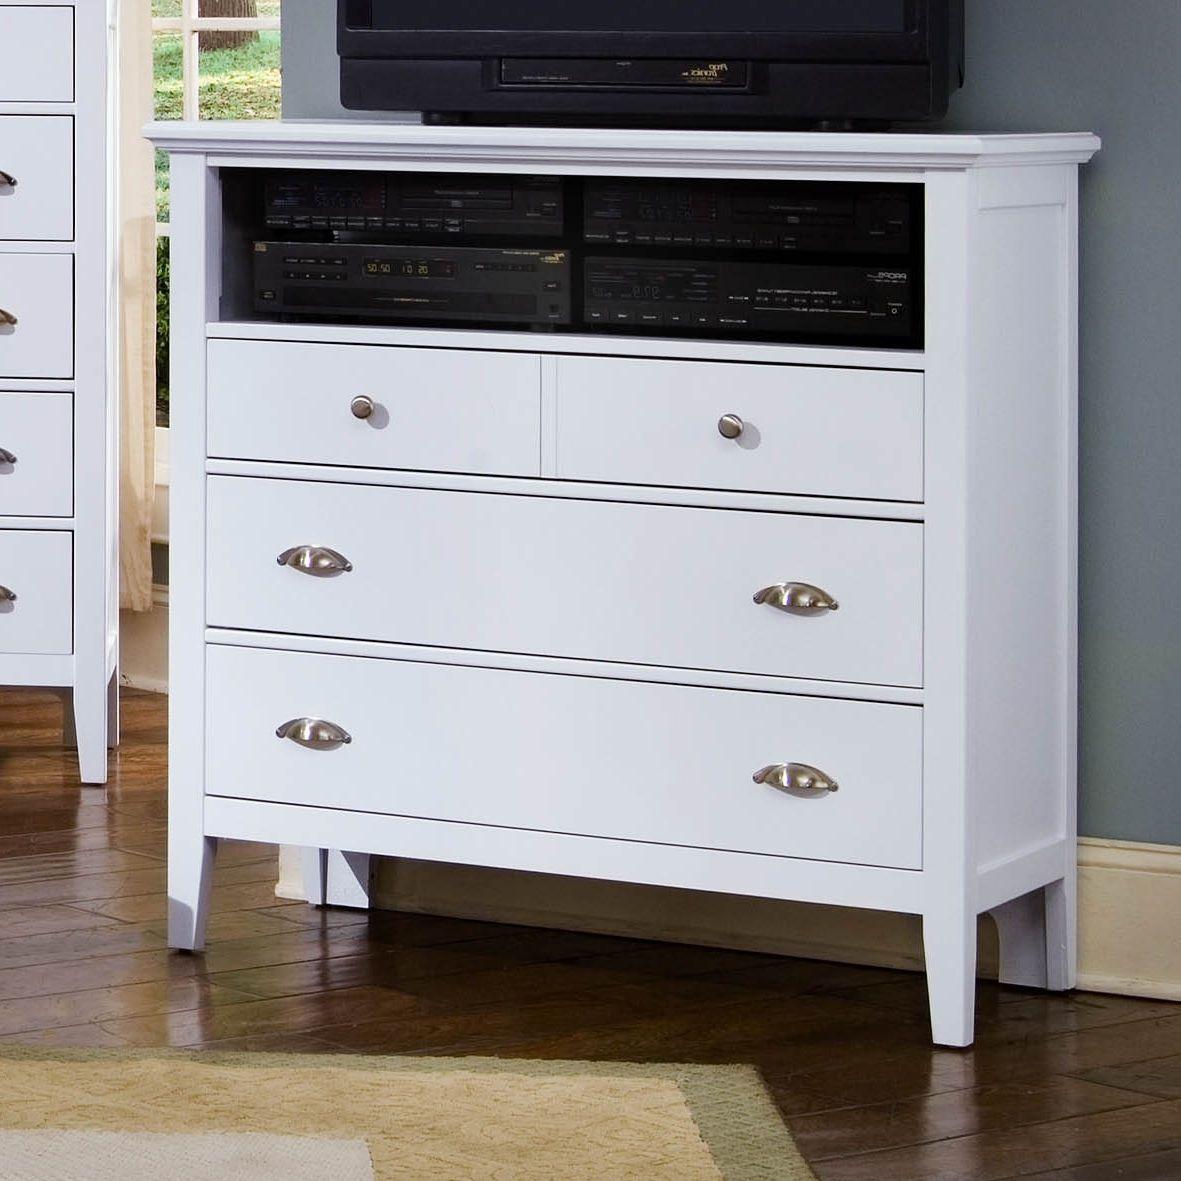 turn a tall dresser into an entertainment center. | Makeover ...